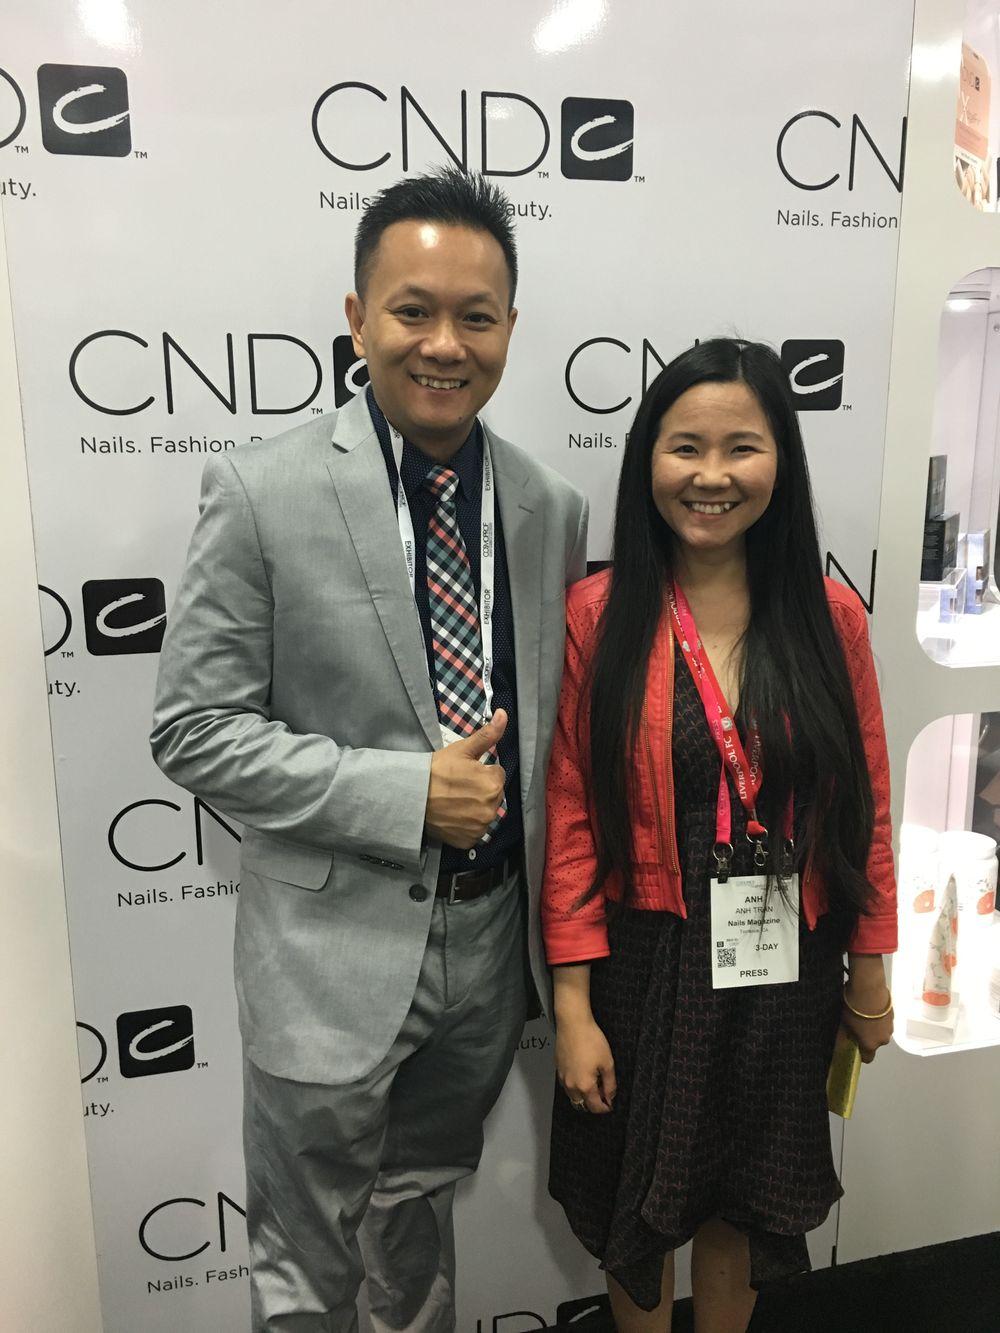 <p>CND's new Brand Development Adviser Tan Nguyen and VietSALON's Anh Tran</p>